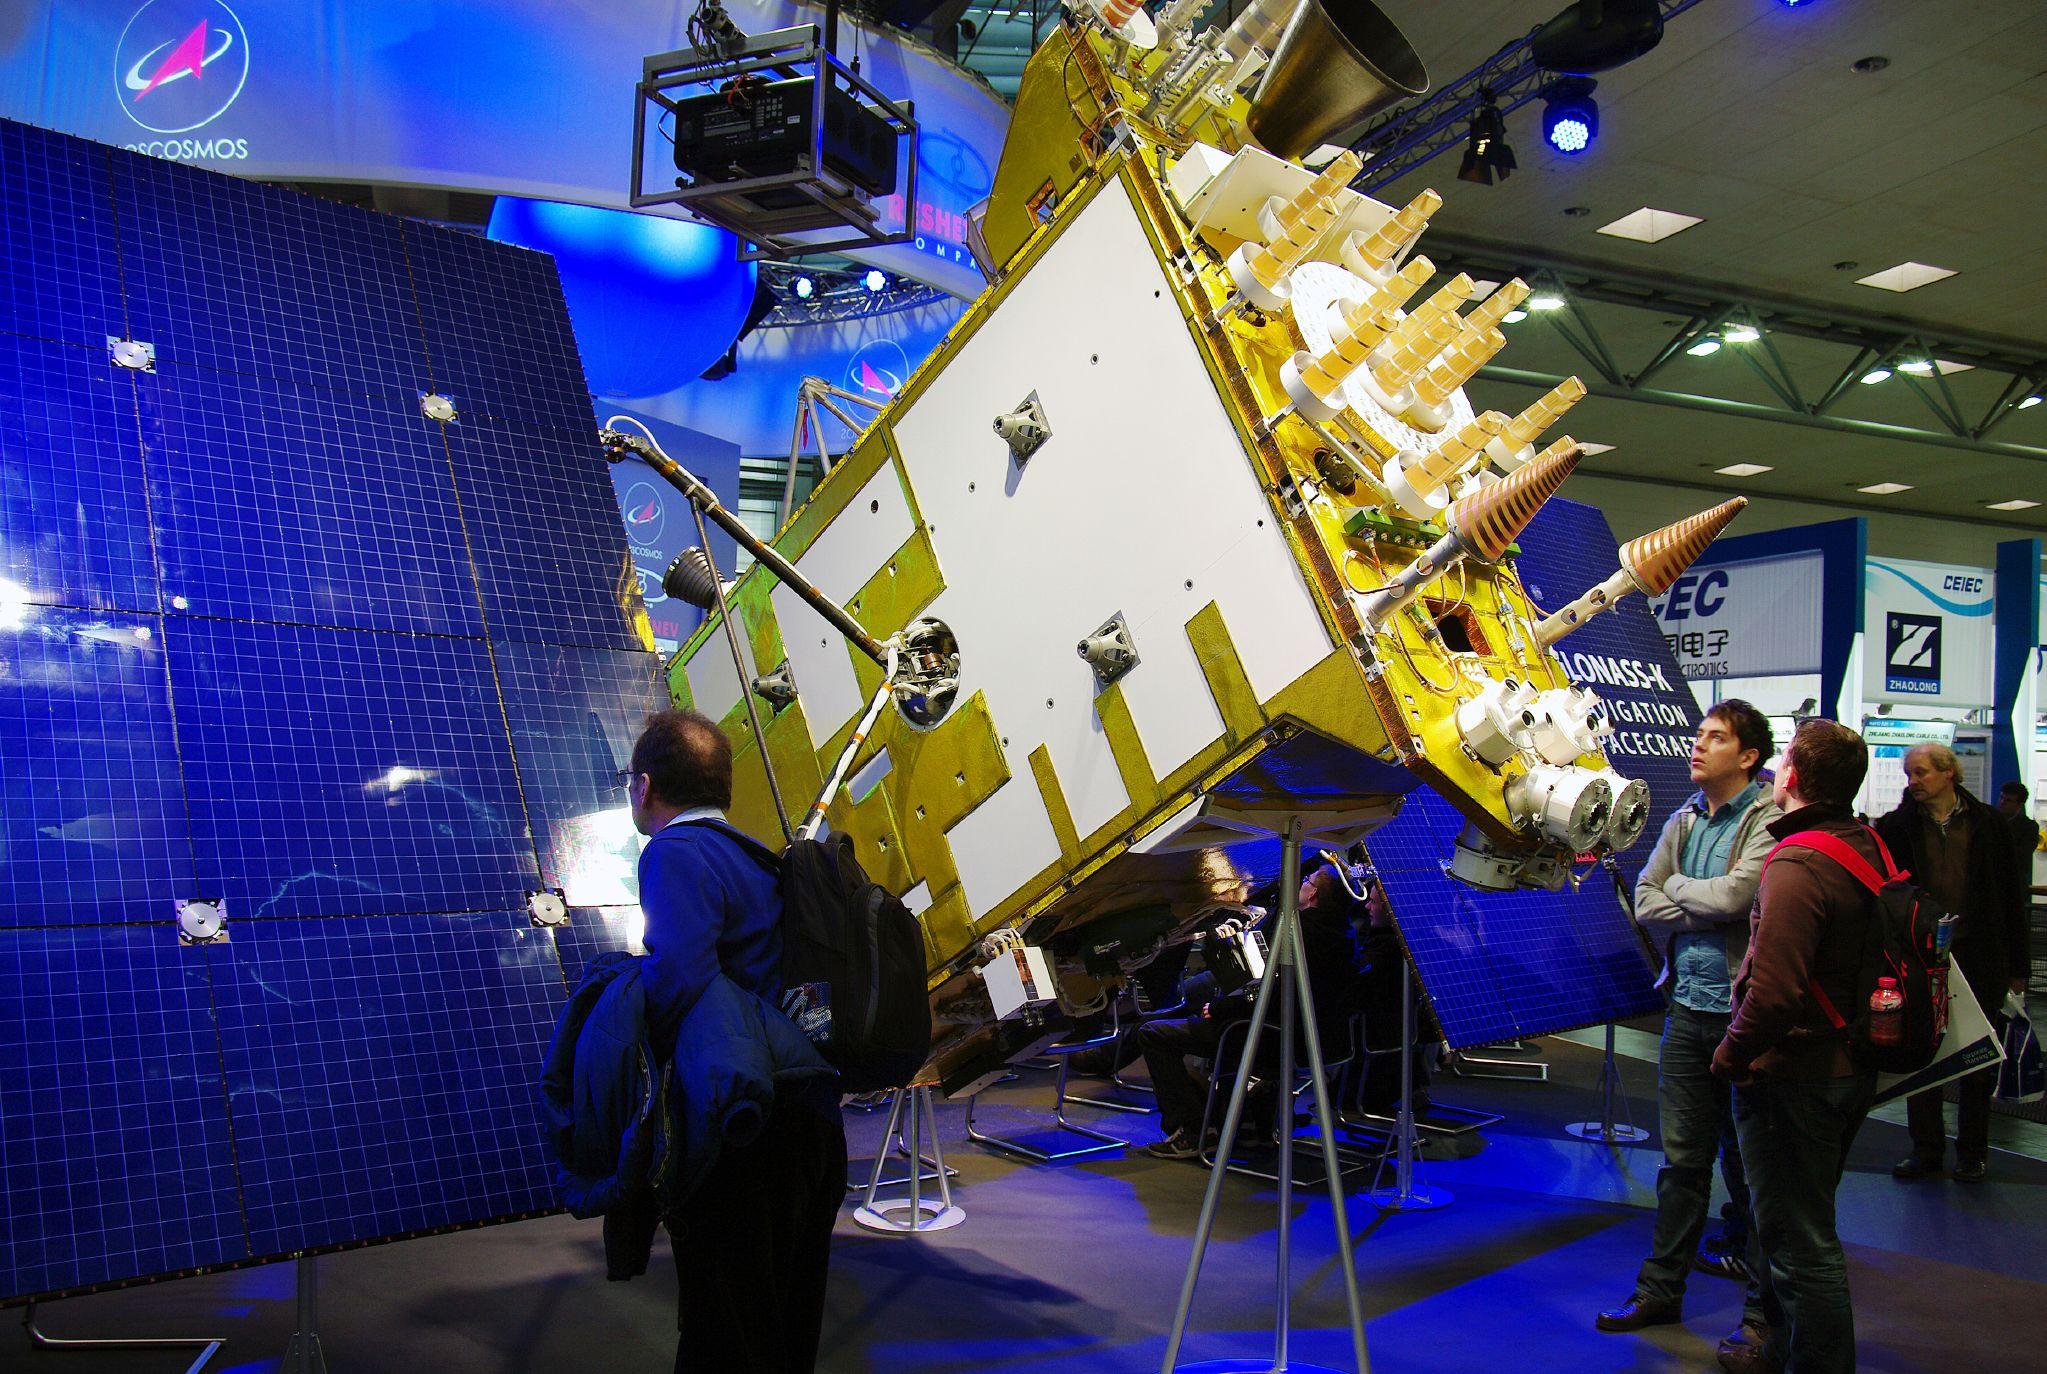 CeBIT 전시회에 소개된 러시아 인공위성 위치확인시스템 '글로나스'용 인공위성의 실제 크기 모형. 사람 키 보다 훨씬 클 정도로 대형이다. 위키미디어 제공.